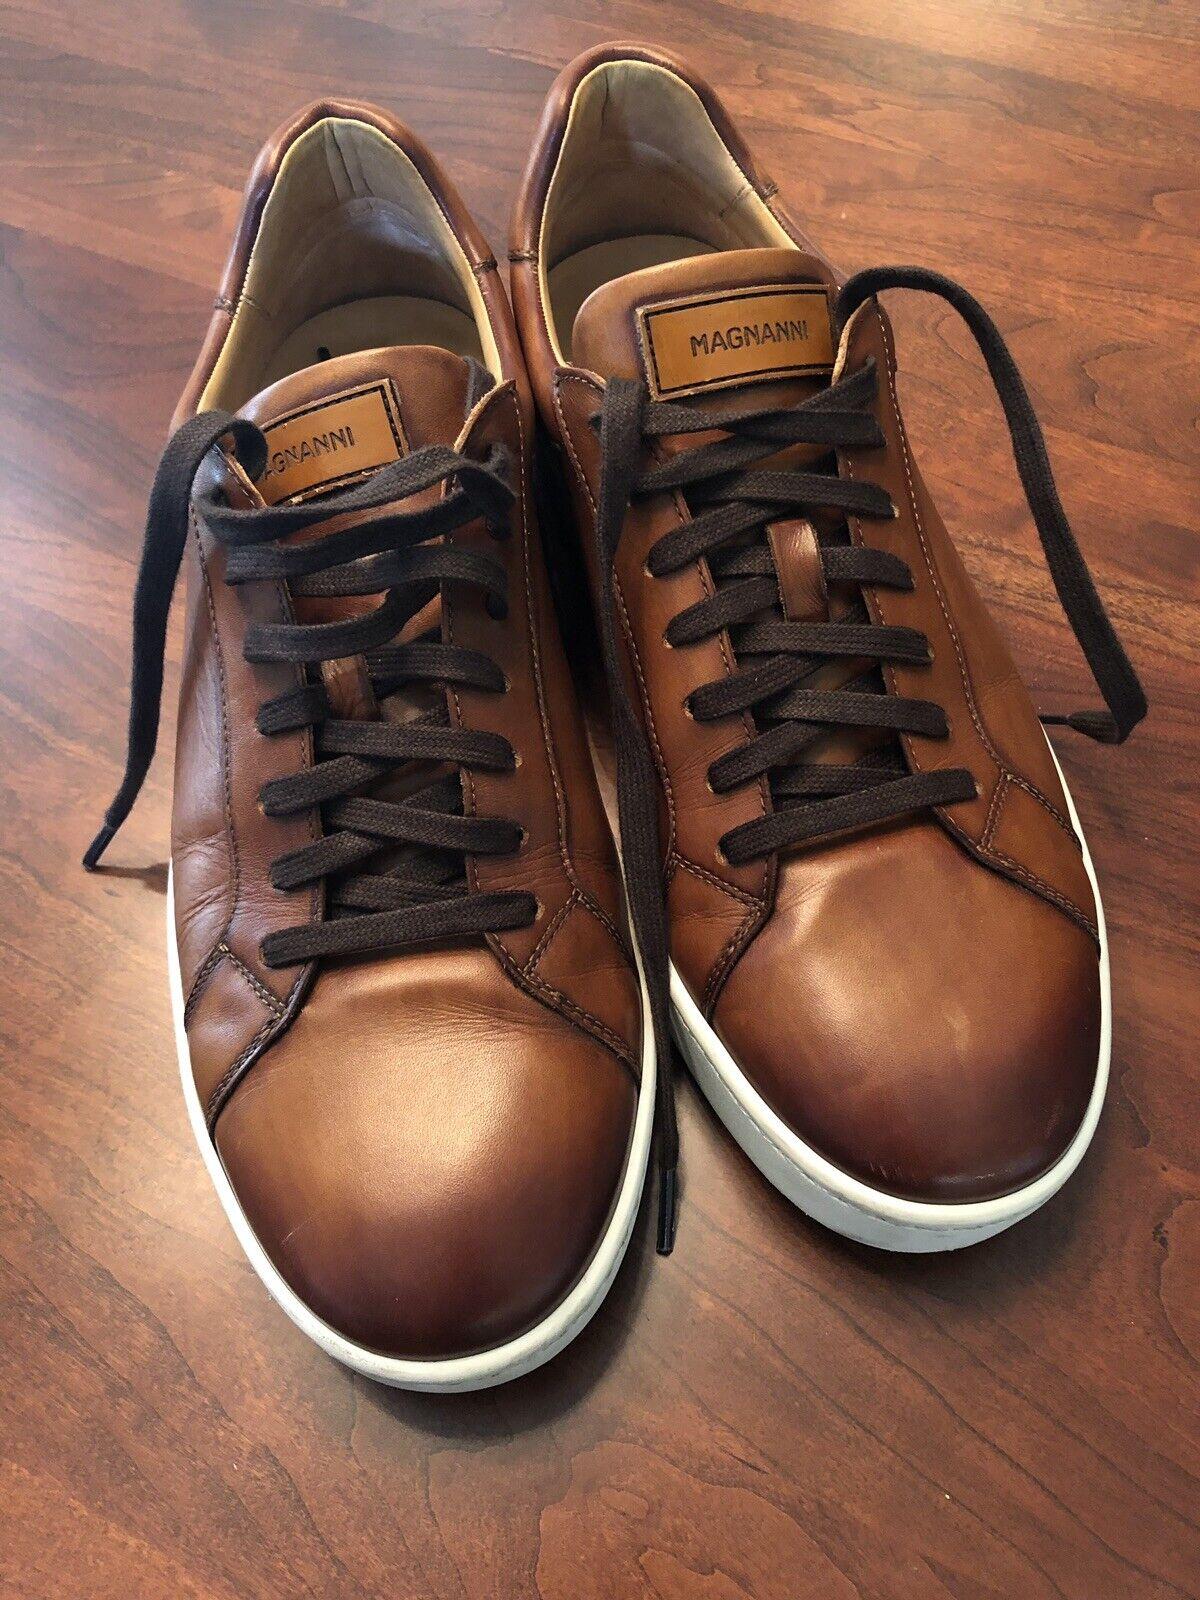 Magnannl Caballero Cognac Lace Up scarpe da ginnastica scarpe Dimensione 11 US (Model 19613)